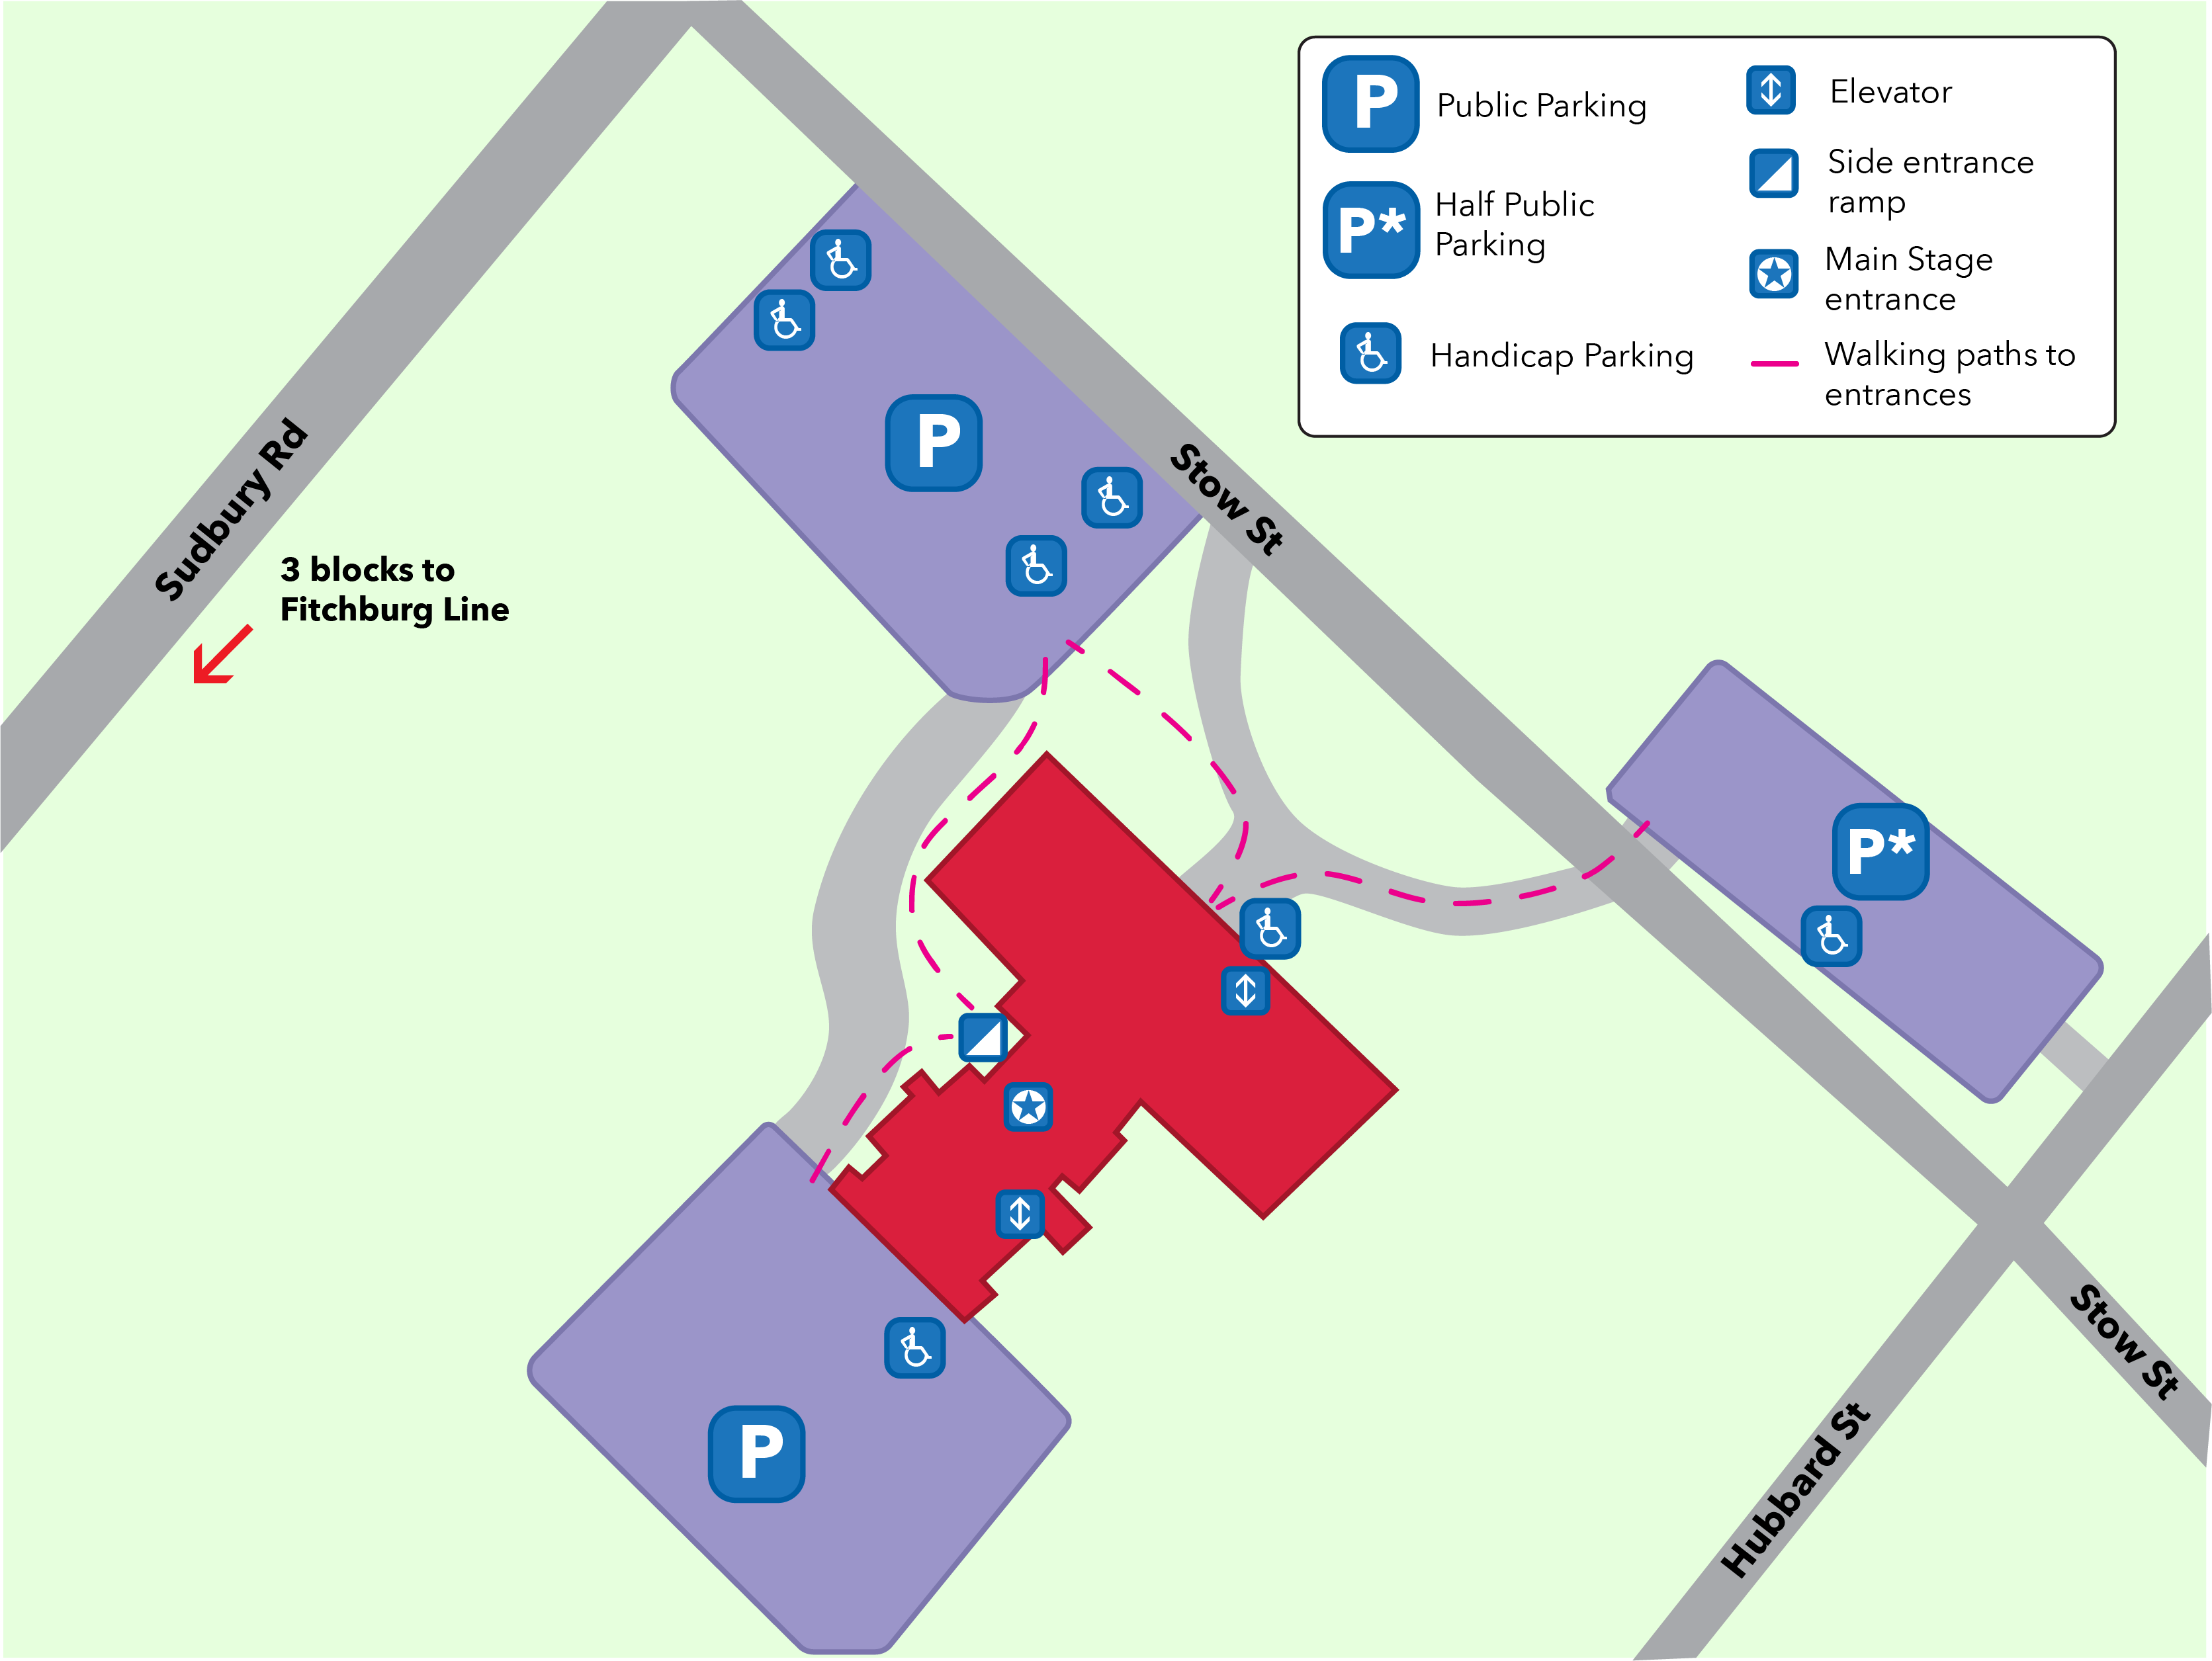 Map of ADA parking and entrances around The Umbrella.